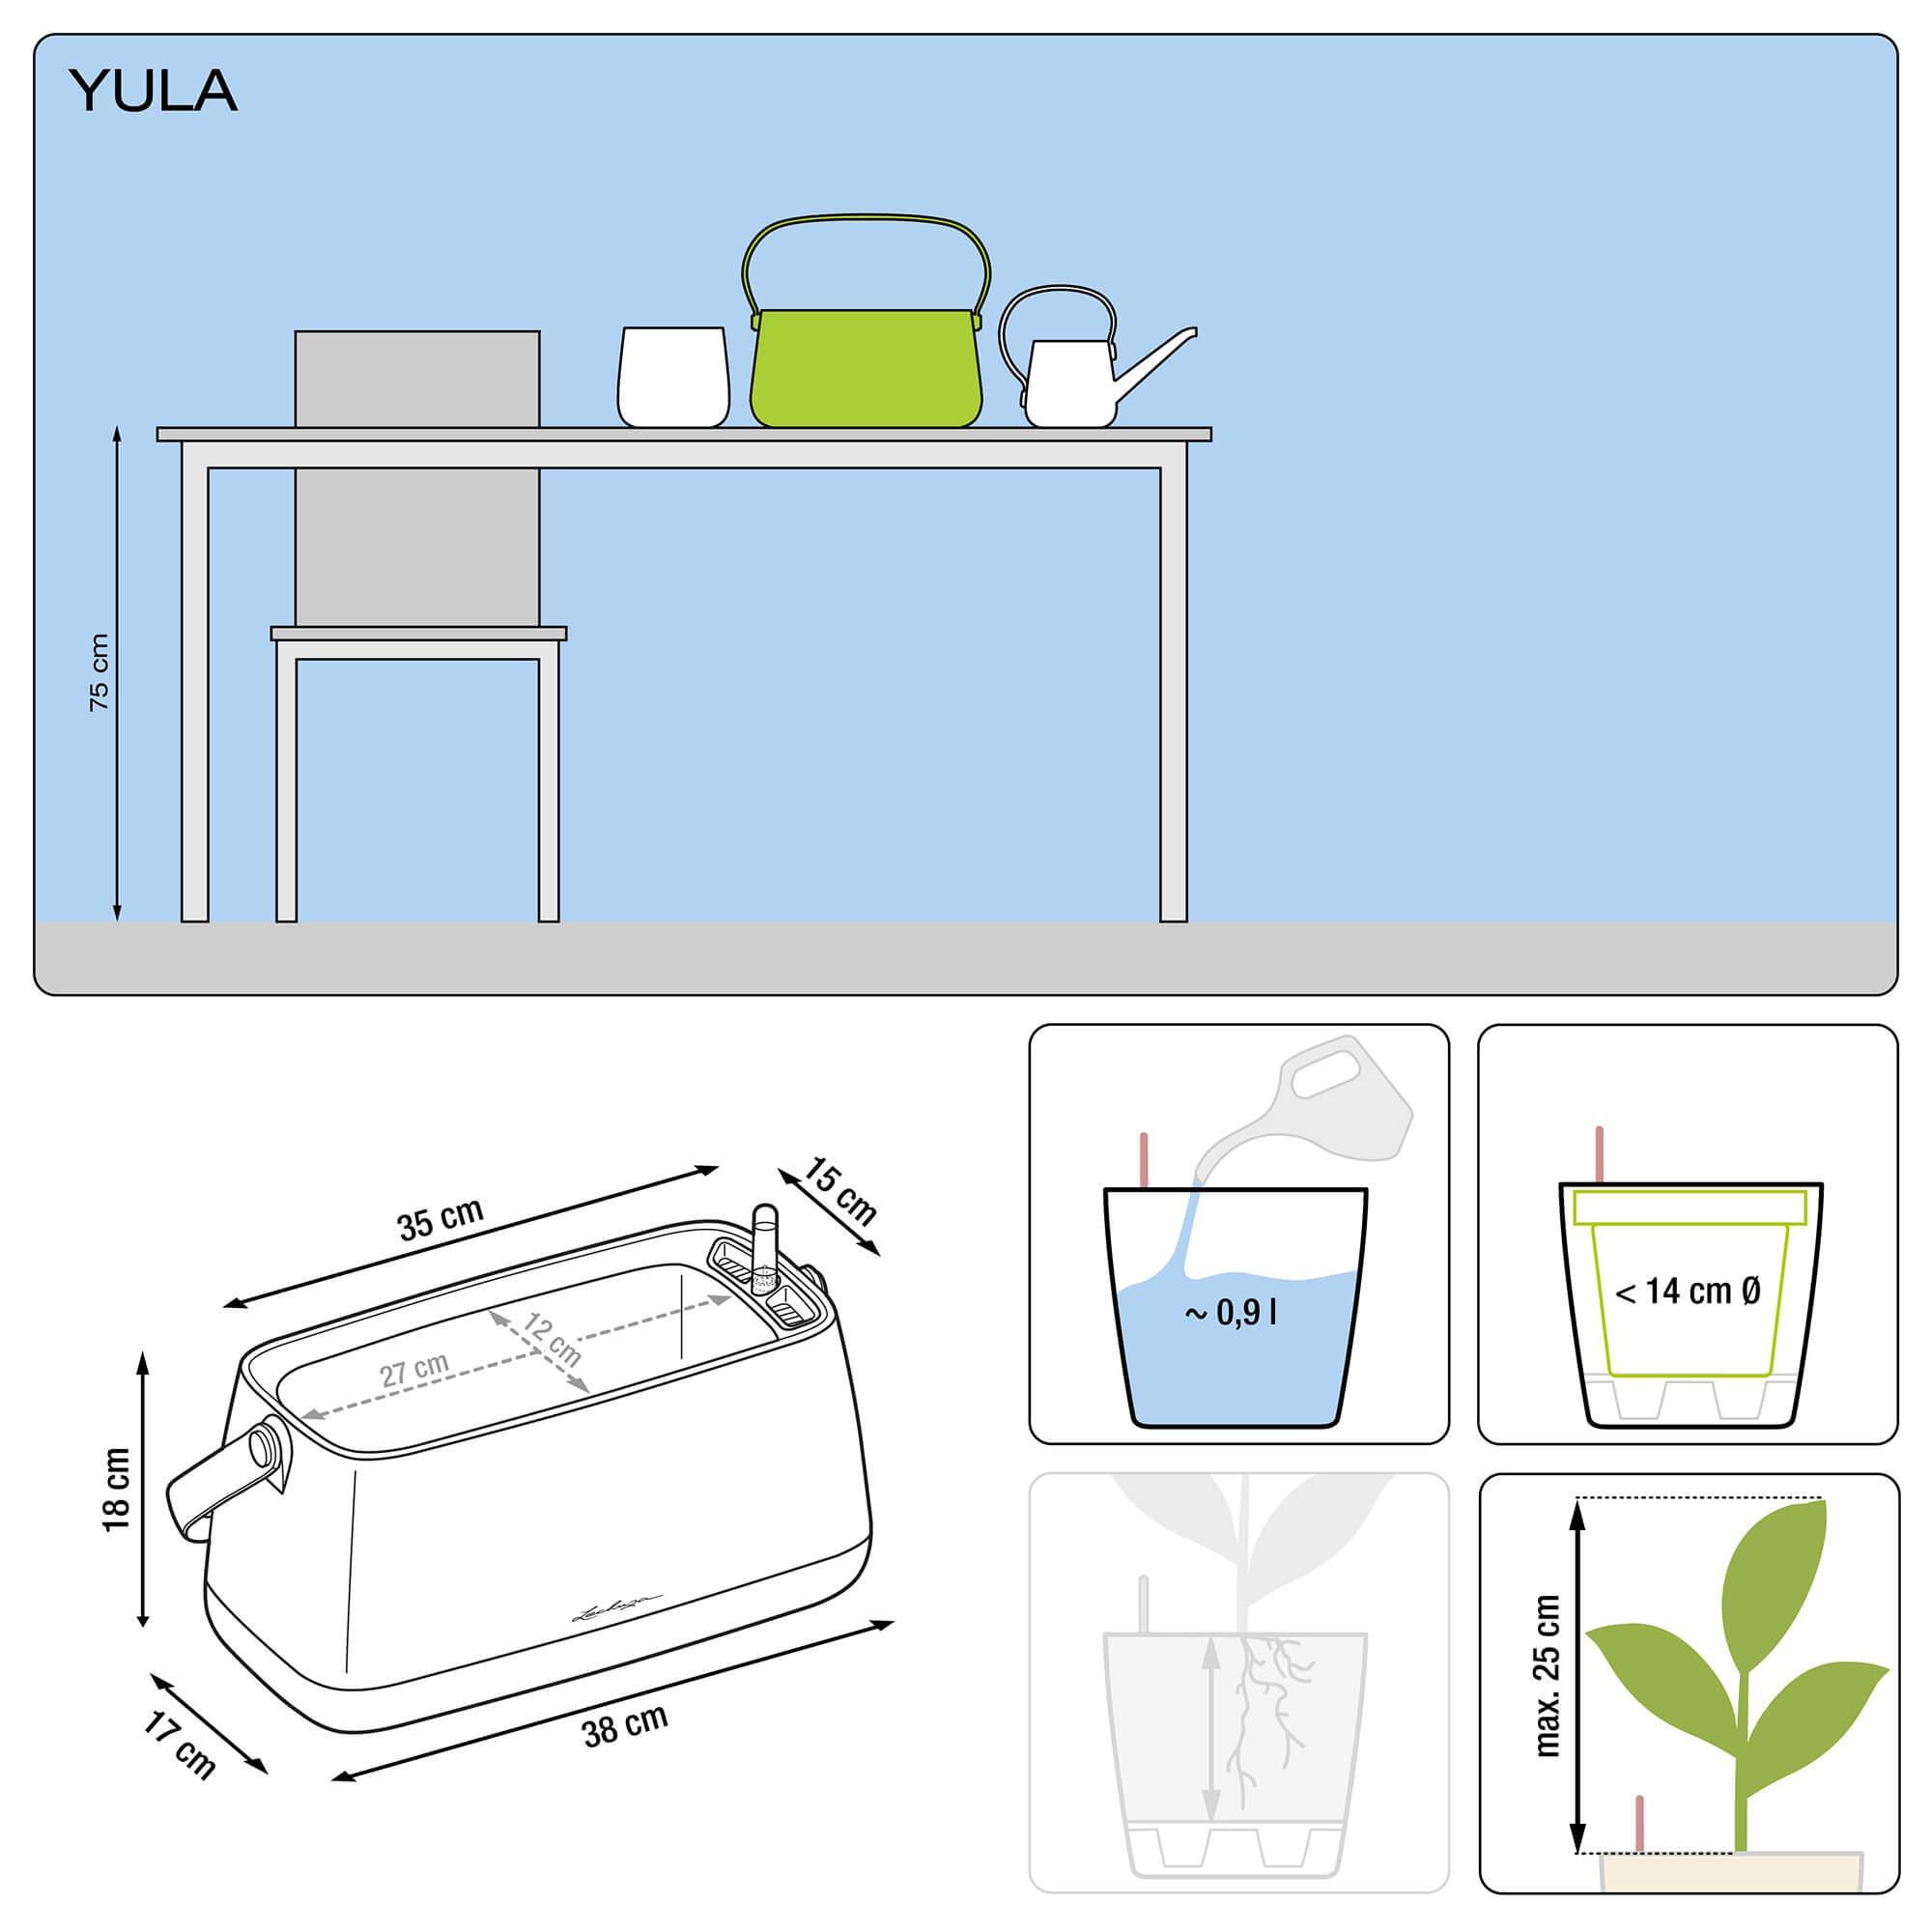 YULA Pflanztasche weiß/grau seidenmatt - Bild 2